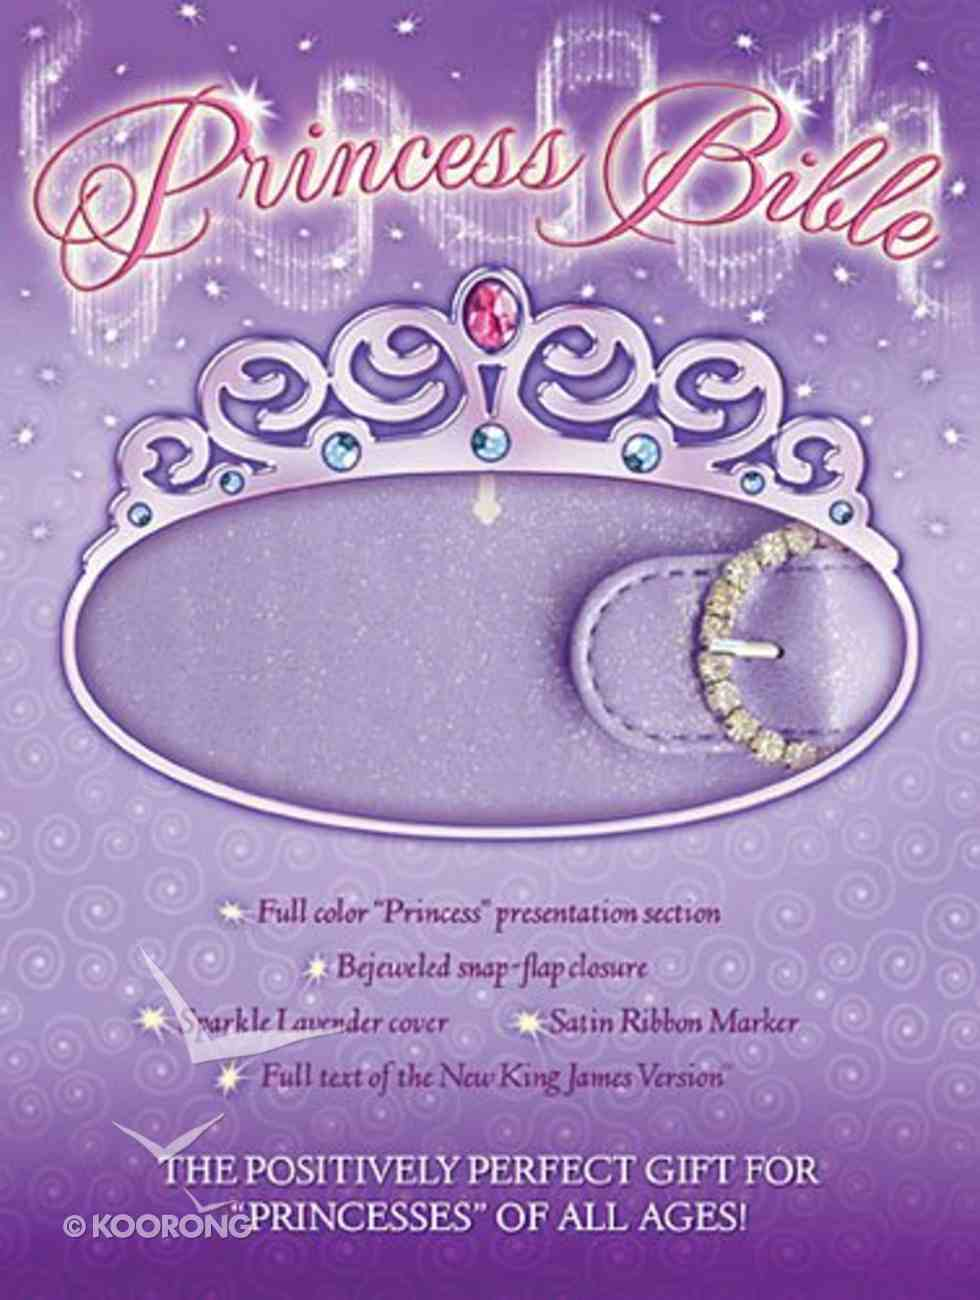 NKJV Princess Bible Lavender With Magnetic Closure Premium Imitation Leather